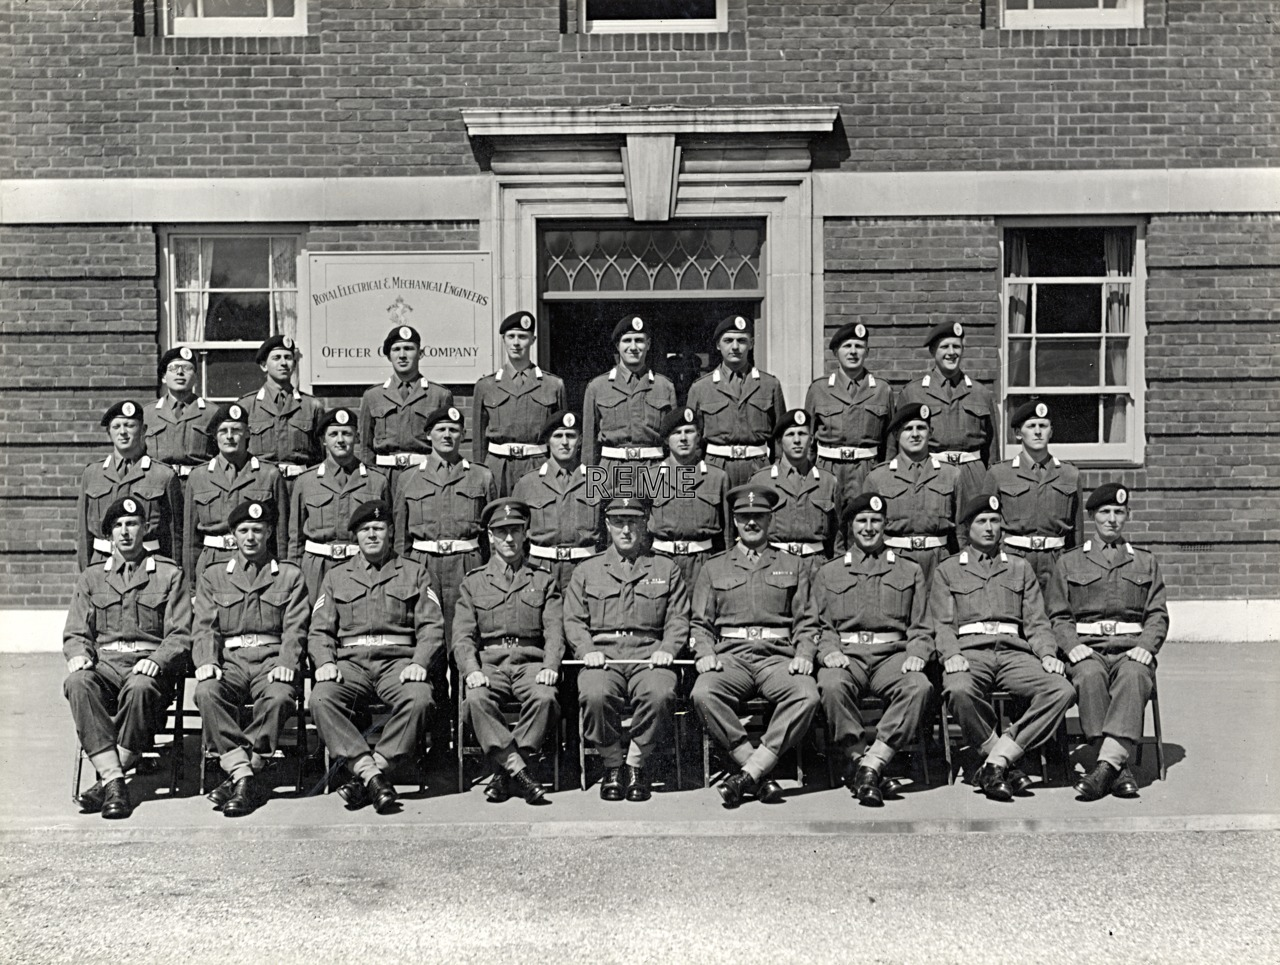 Officer Cadet Company, REME, Bordon: Intake No 11, April 1955